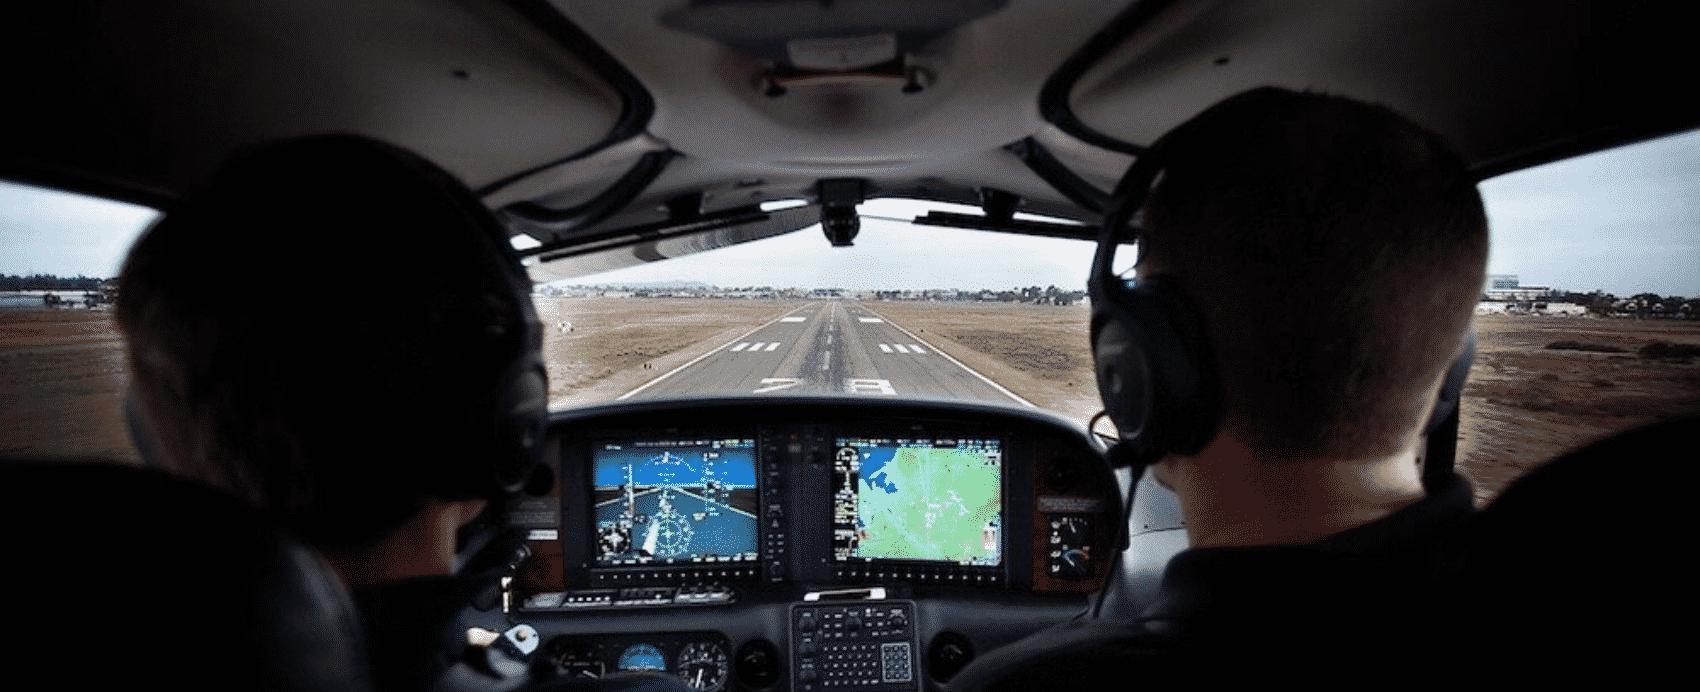 Philip Nijnens and Ronnie Greathouse Flying Cirrus SR22